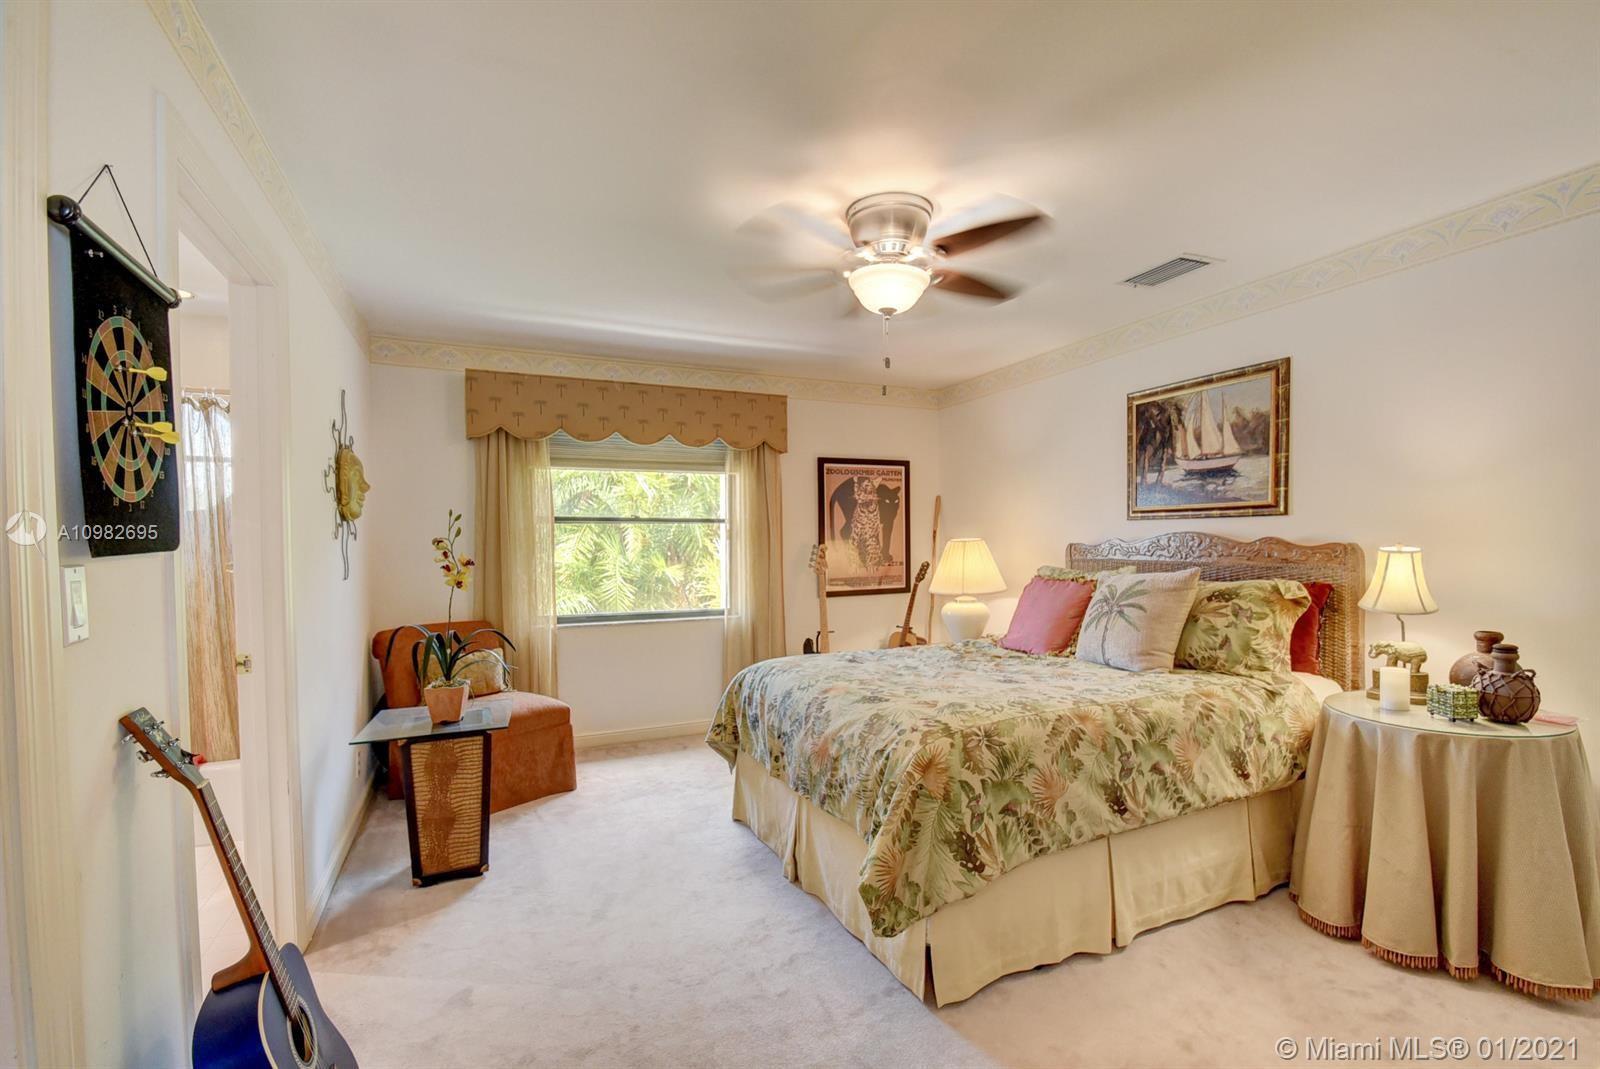 2105 NW 60th Cir, Boca Raton, Florida 33496, 3 Bedrooms Bedrooms, ,4 BathroomsBathrooms,Residential,For Sale,2105 NW 60th Cir,A10982695